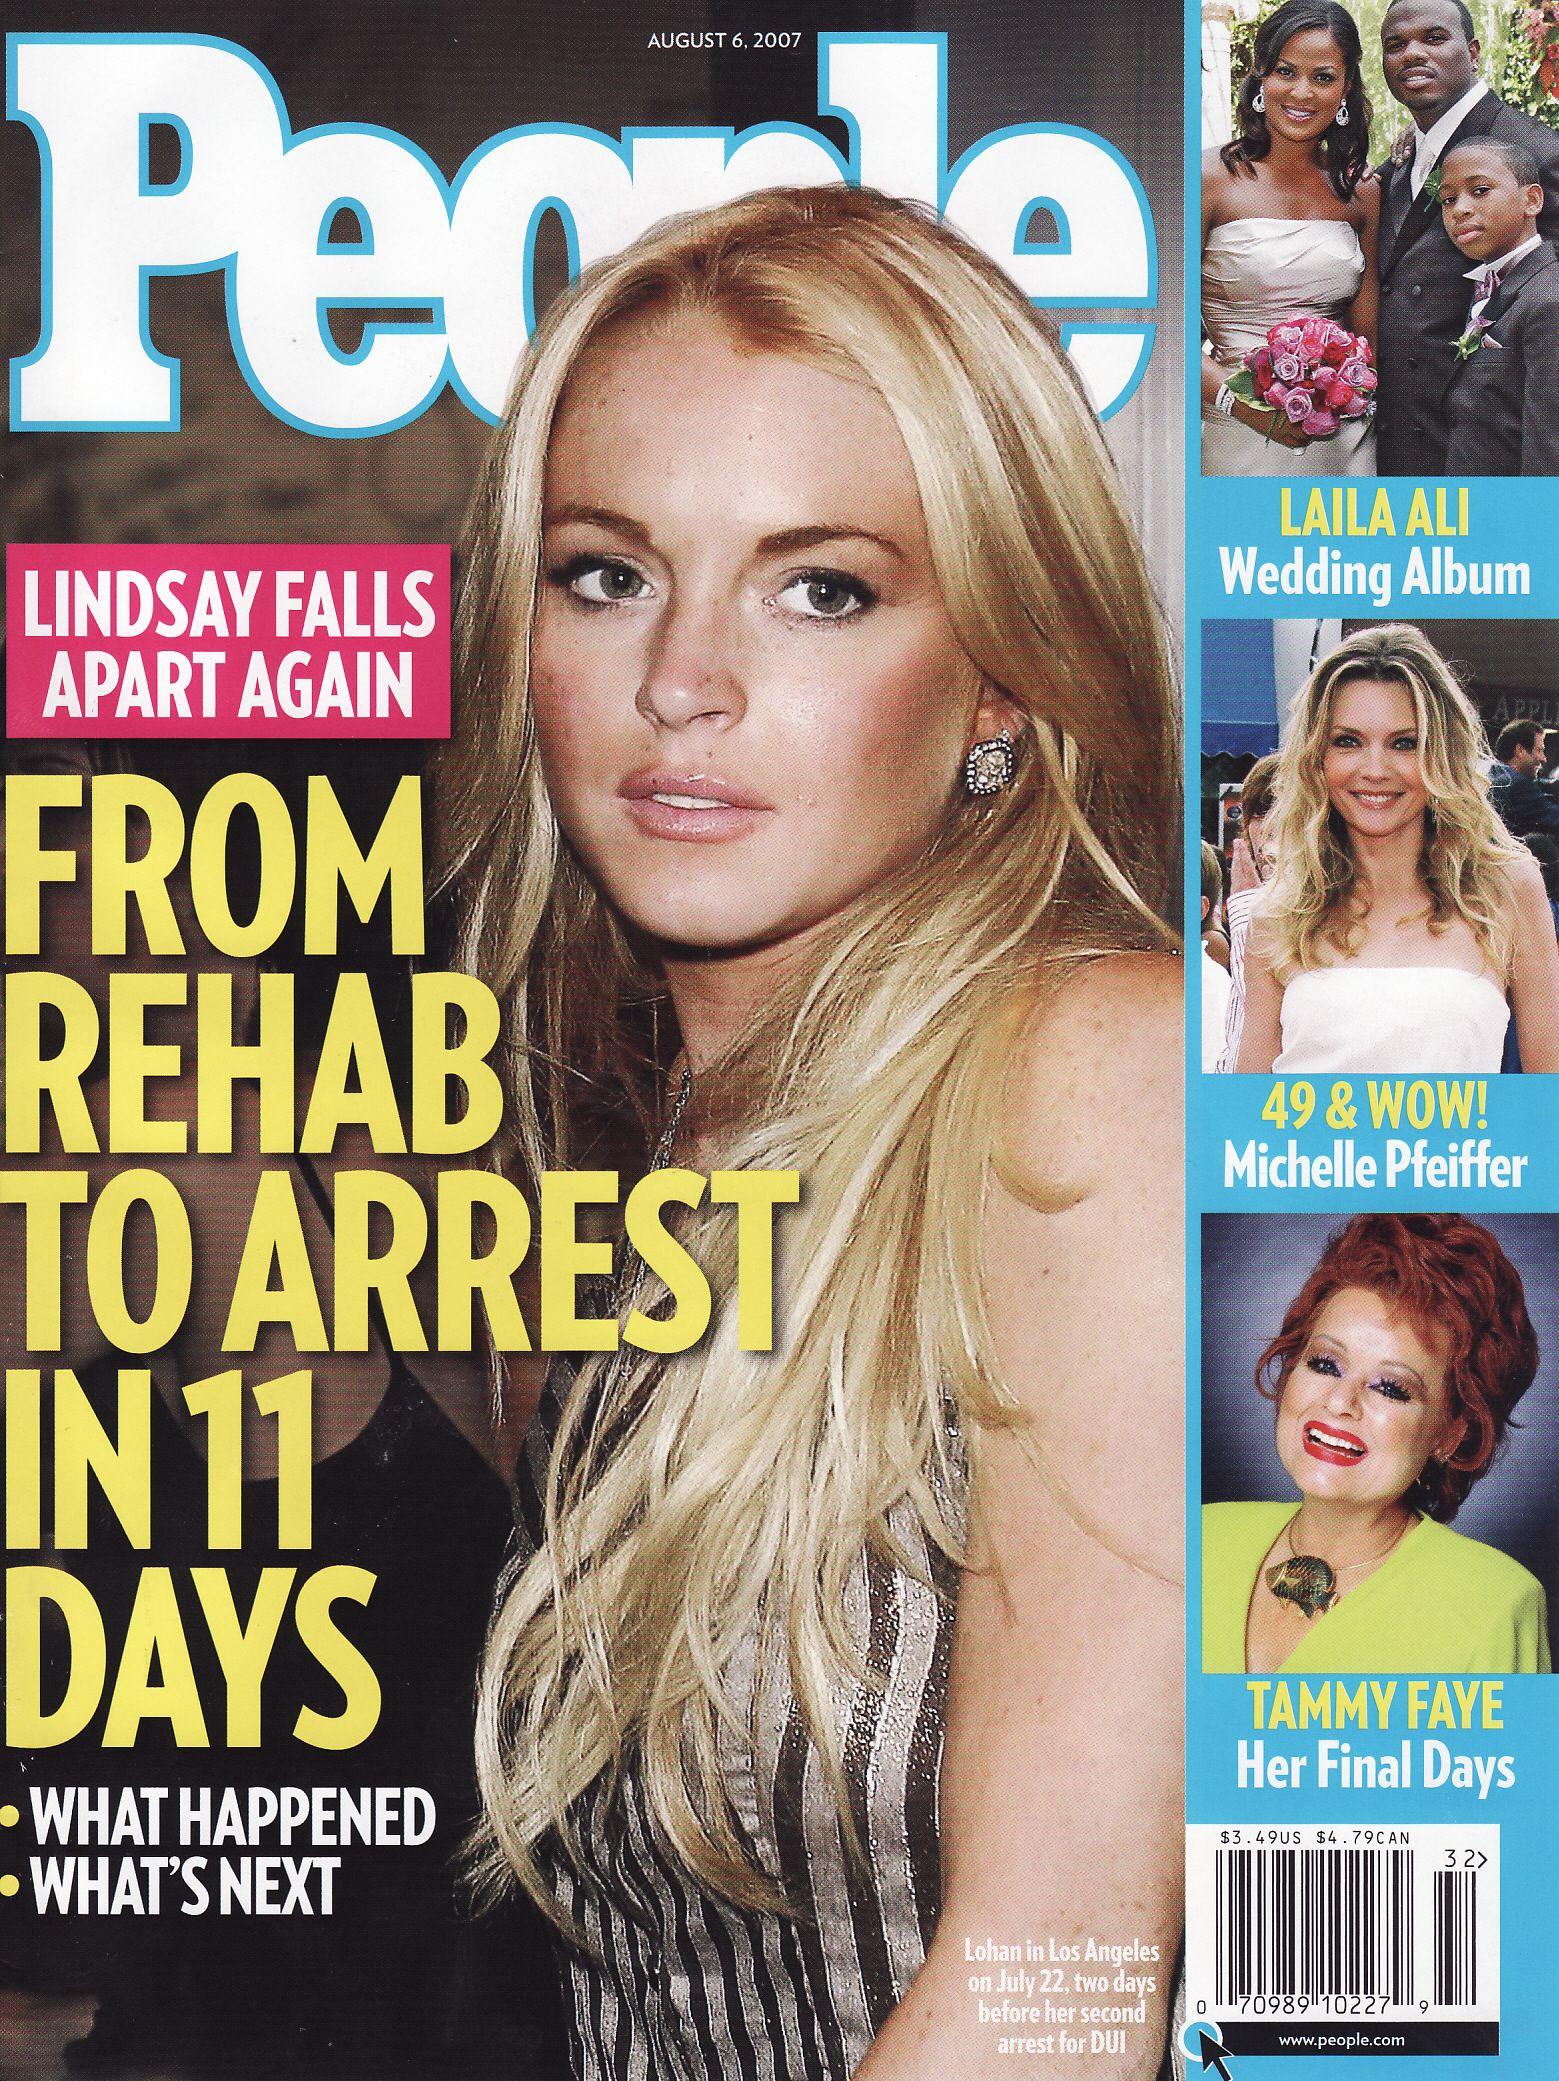 Lindsay Lohan in People Magazine, August 6 2007 | People magazine covers,  People magazine, Lindsay